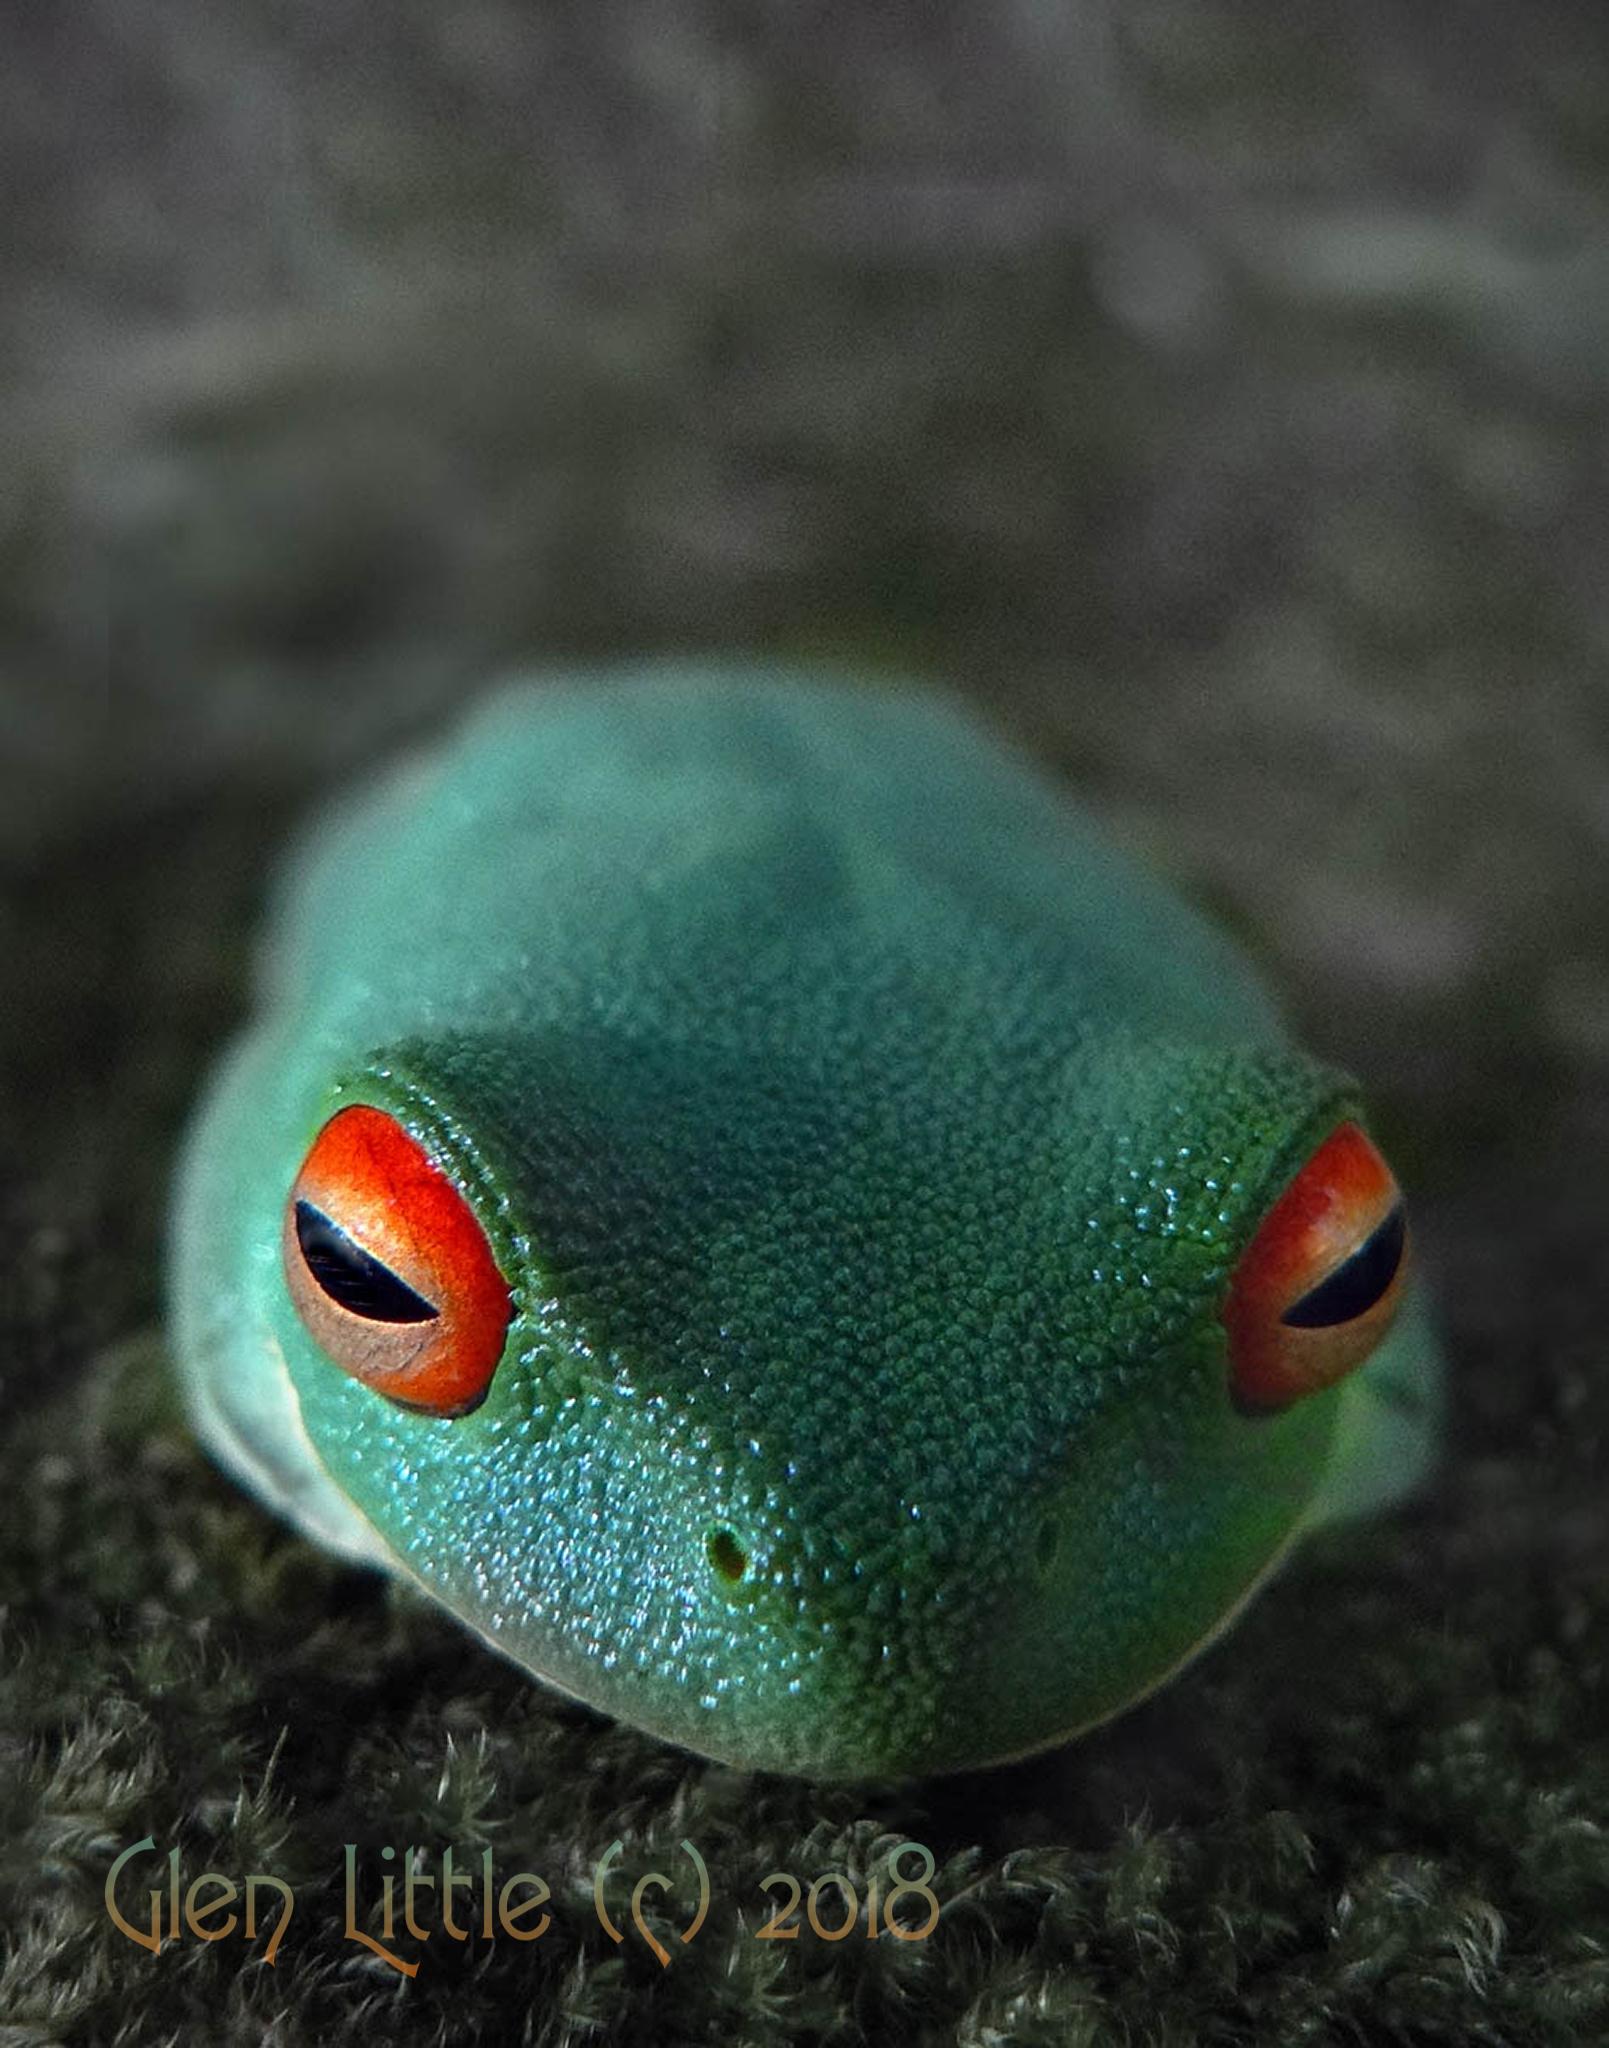 desatRed Eyed Frog (1).jpg